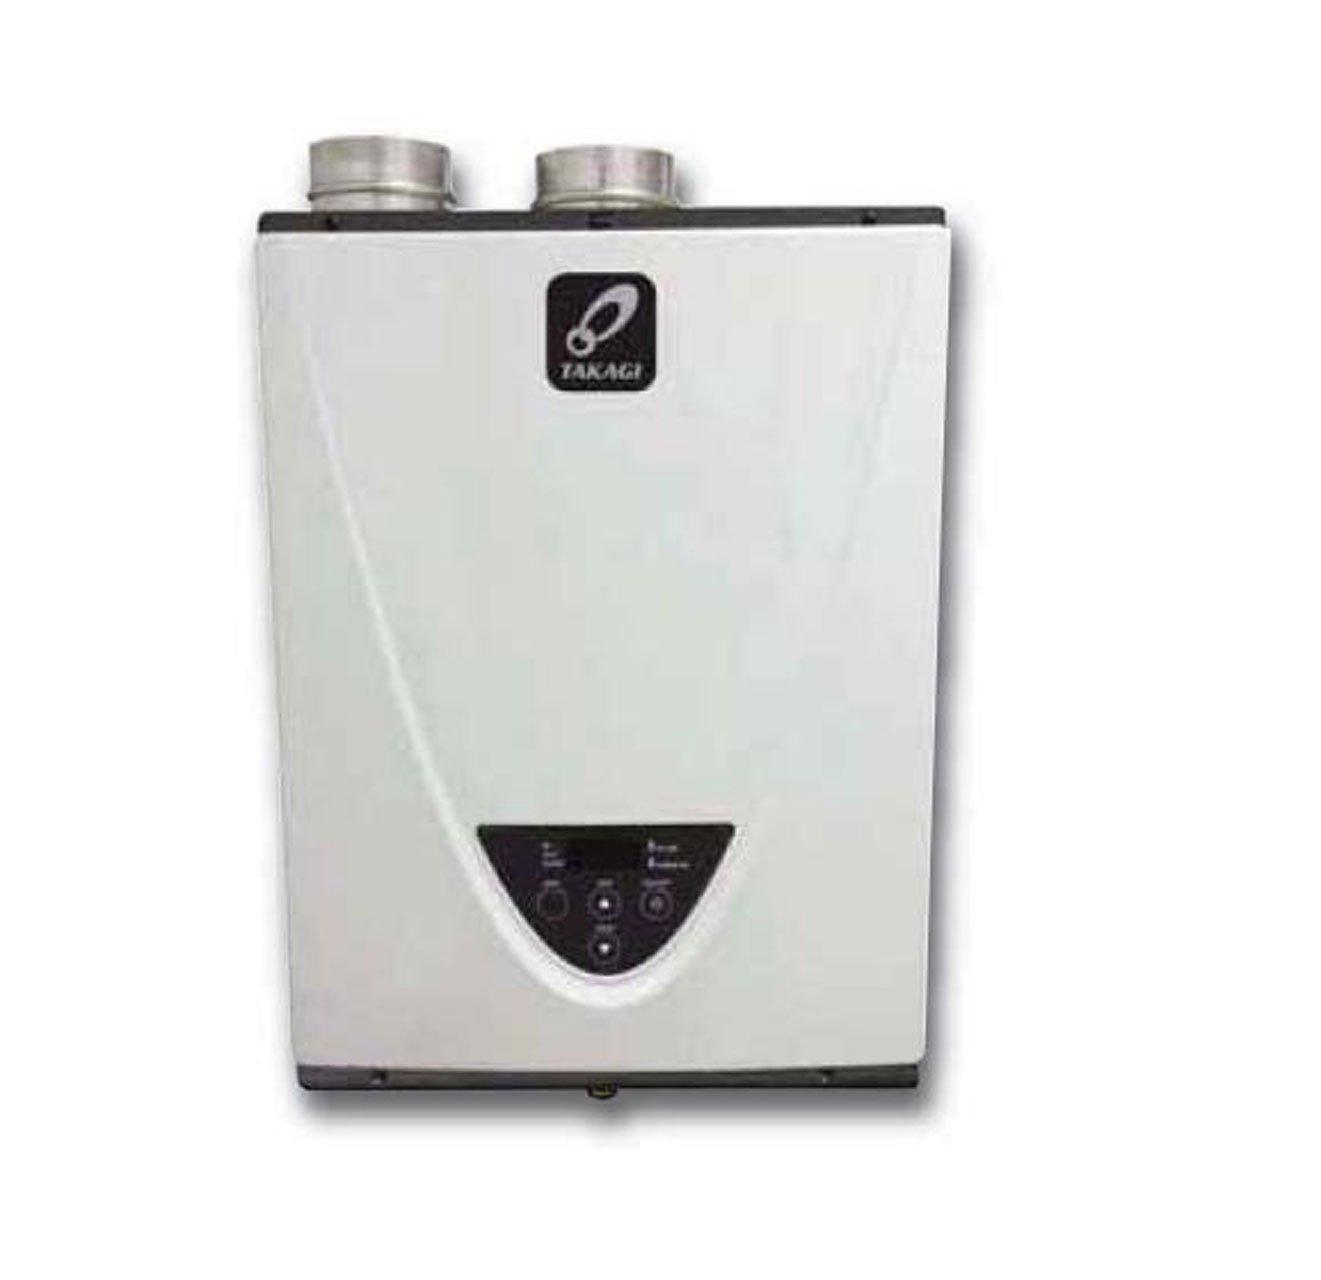 T H3 DV N Condensing Efficiency Tankless 10 Gallon